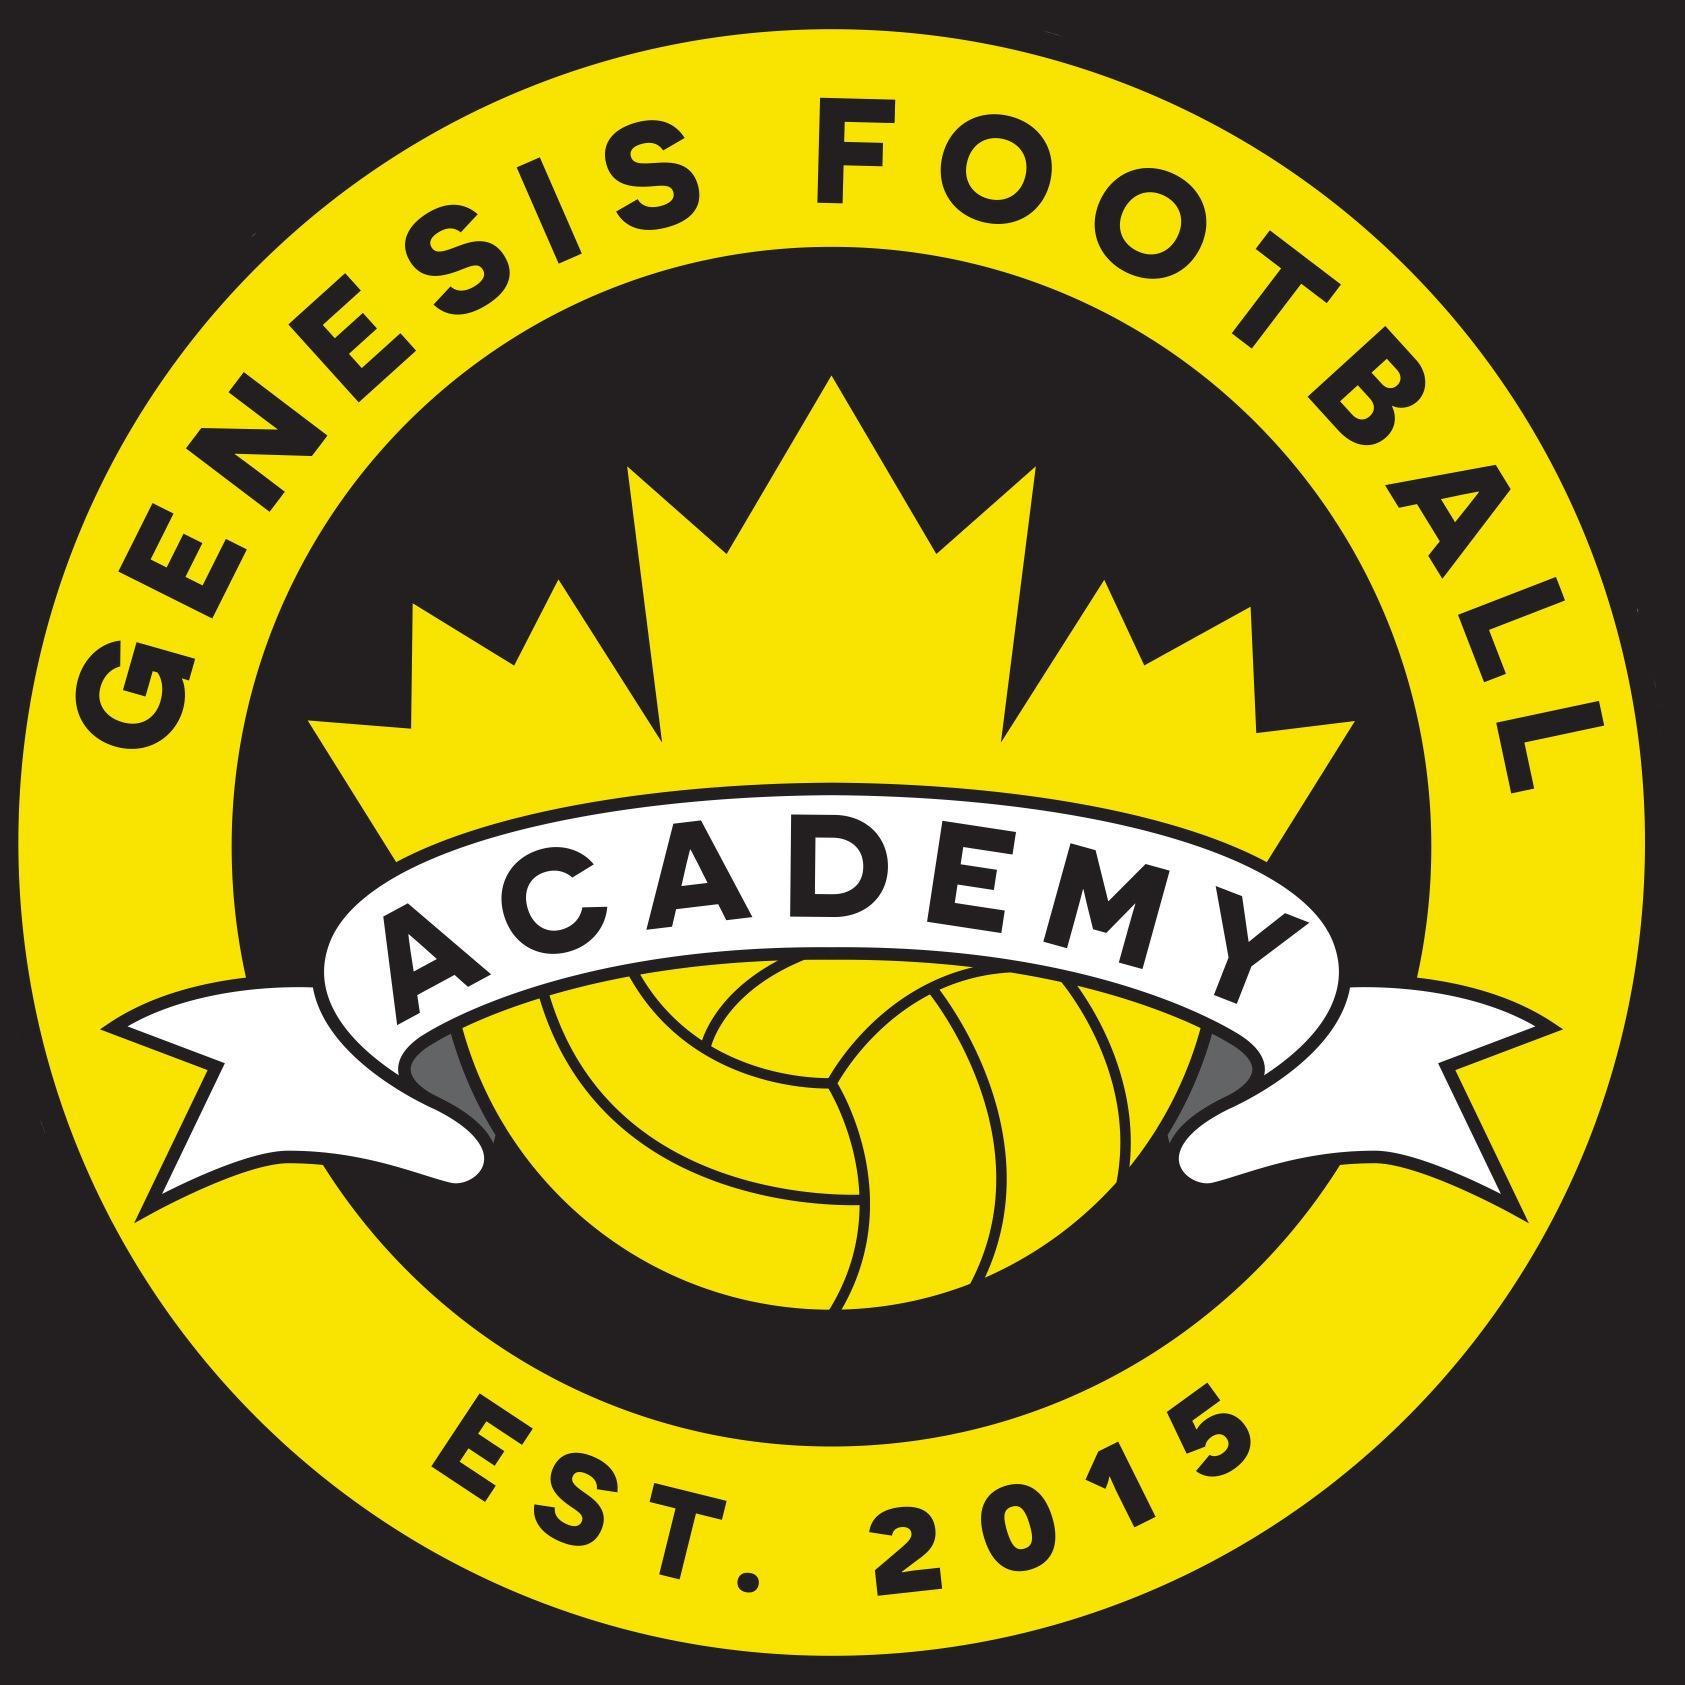 Genesis Football Academy